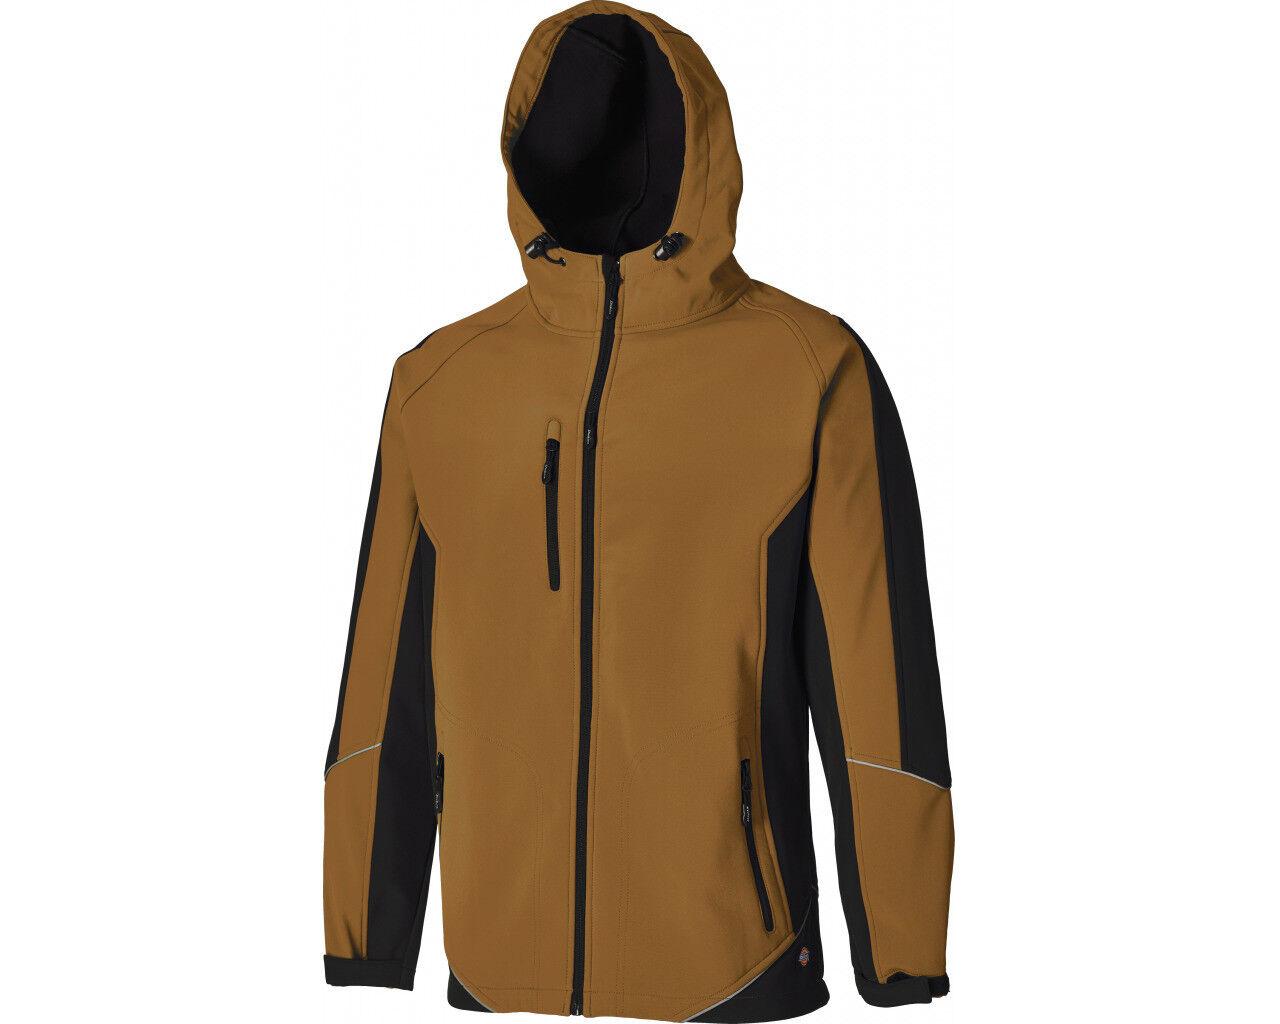 SPECIAL OFFER Dickies Khaki /& Black Waterproof 2 Tone Soft Shell Work Jacket